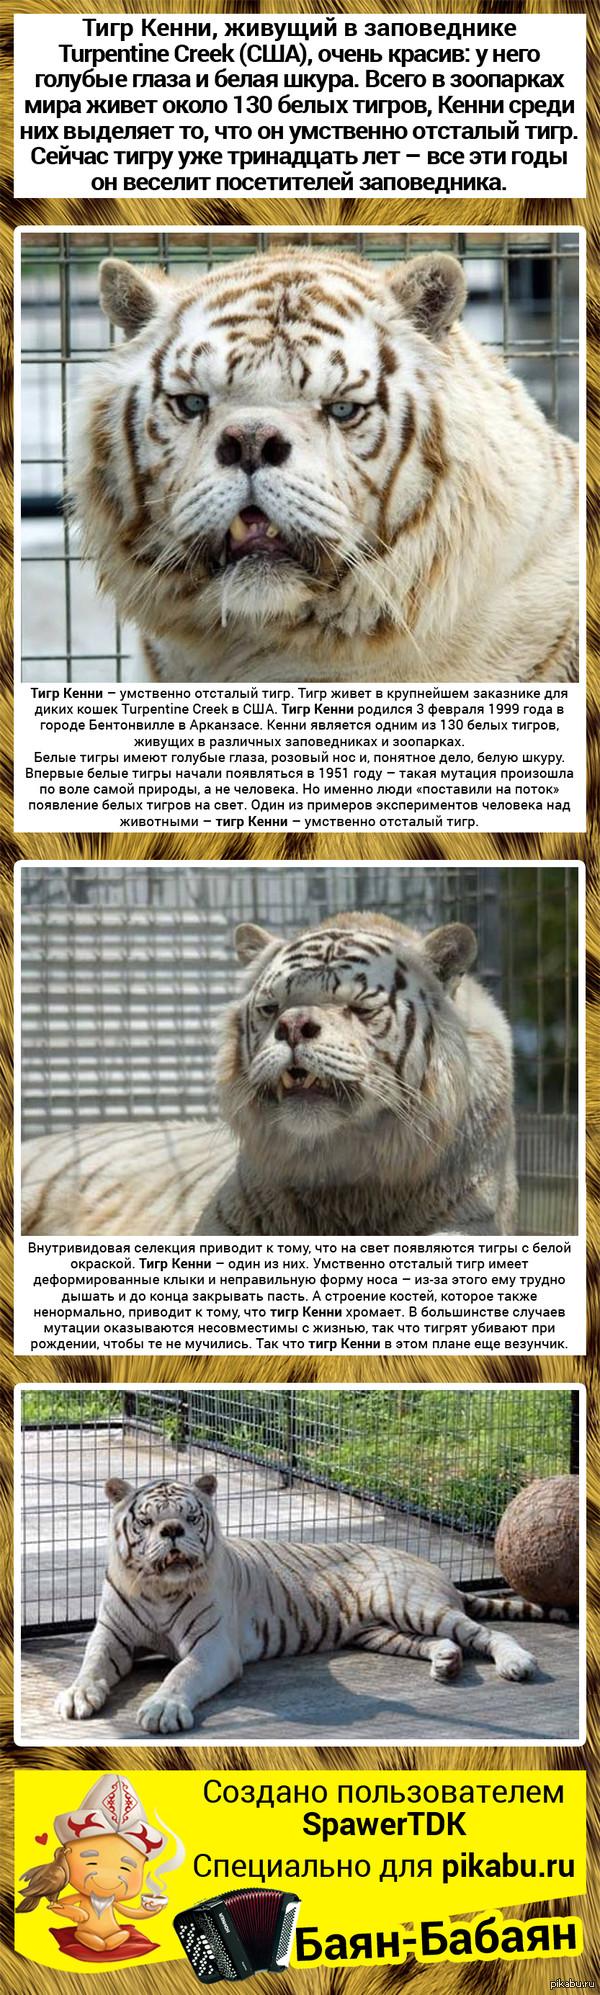 "Тигр Кенни, с которым никто не хочет дружить Немного инфы, в дополнению к посту - <a href=""http://pikabu.ru/story/yeto_kenni_s_nim_nikto_ne_khochet_druzhit_potomu_chto_on_umstvenno_otstalyiy_tigr_647645"">http://pikabu.ru/story/_647645</a>"